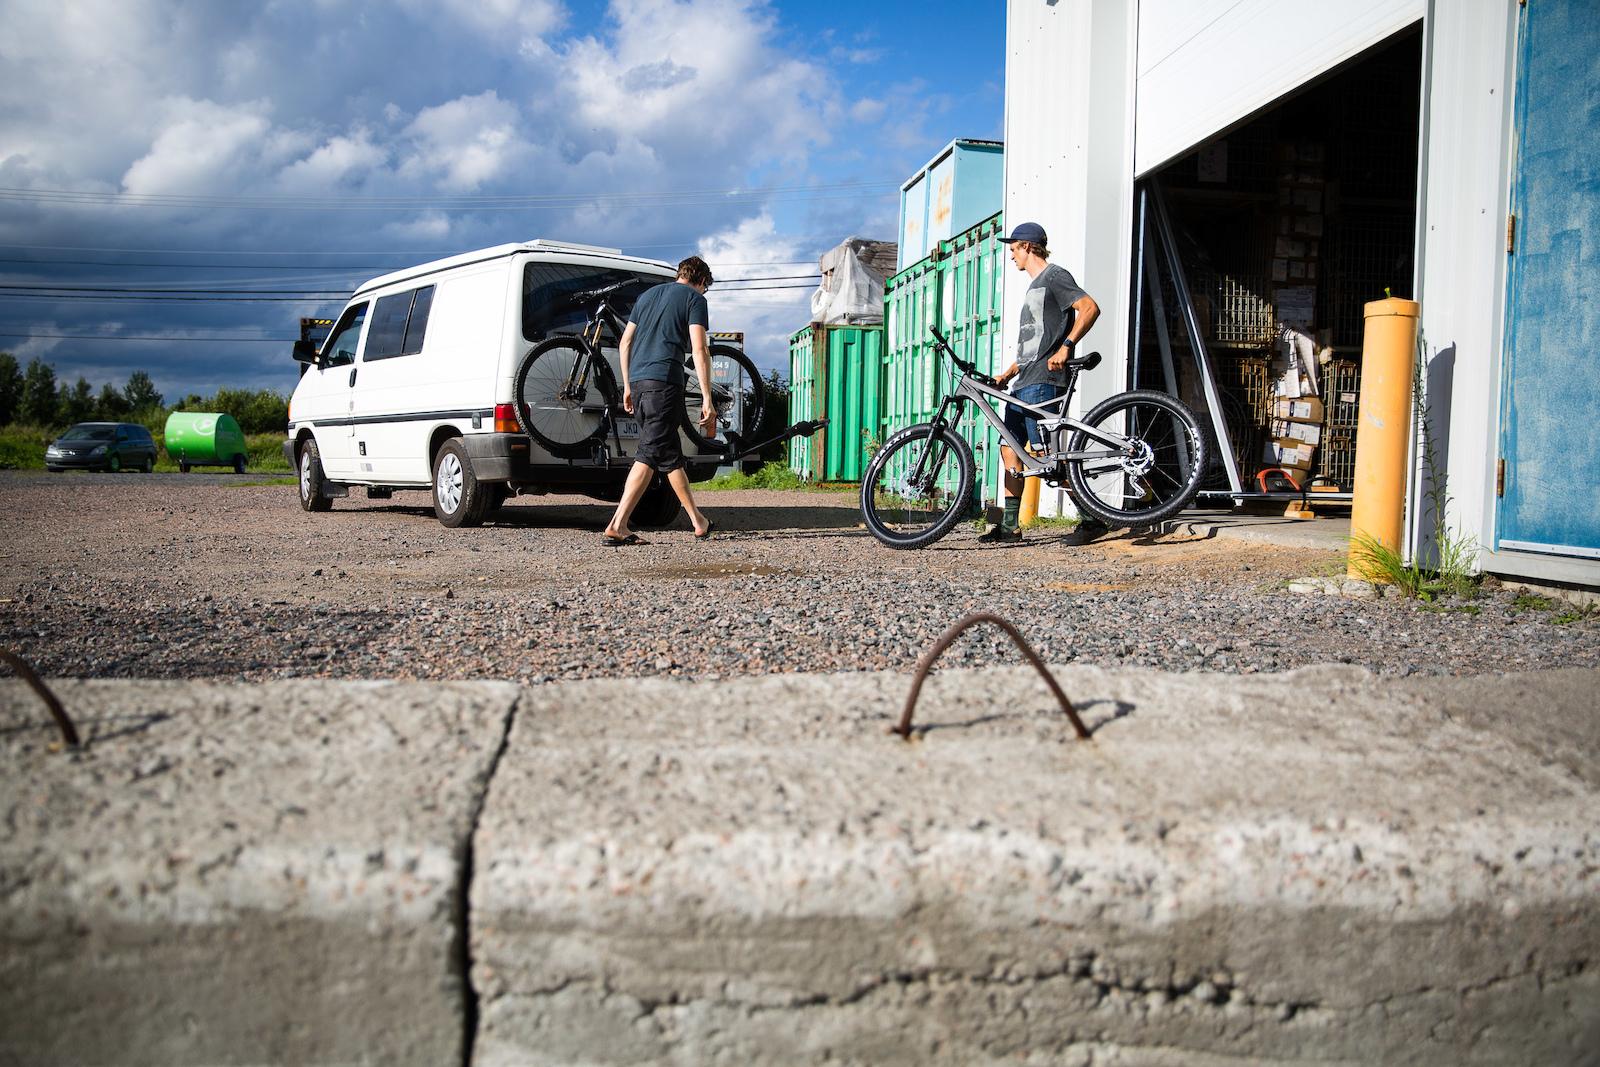 David Regnier Bourque and Julien Boulais load up the whip after work. PHOTO Ben Gavelda